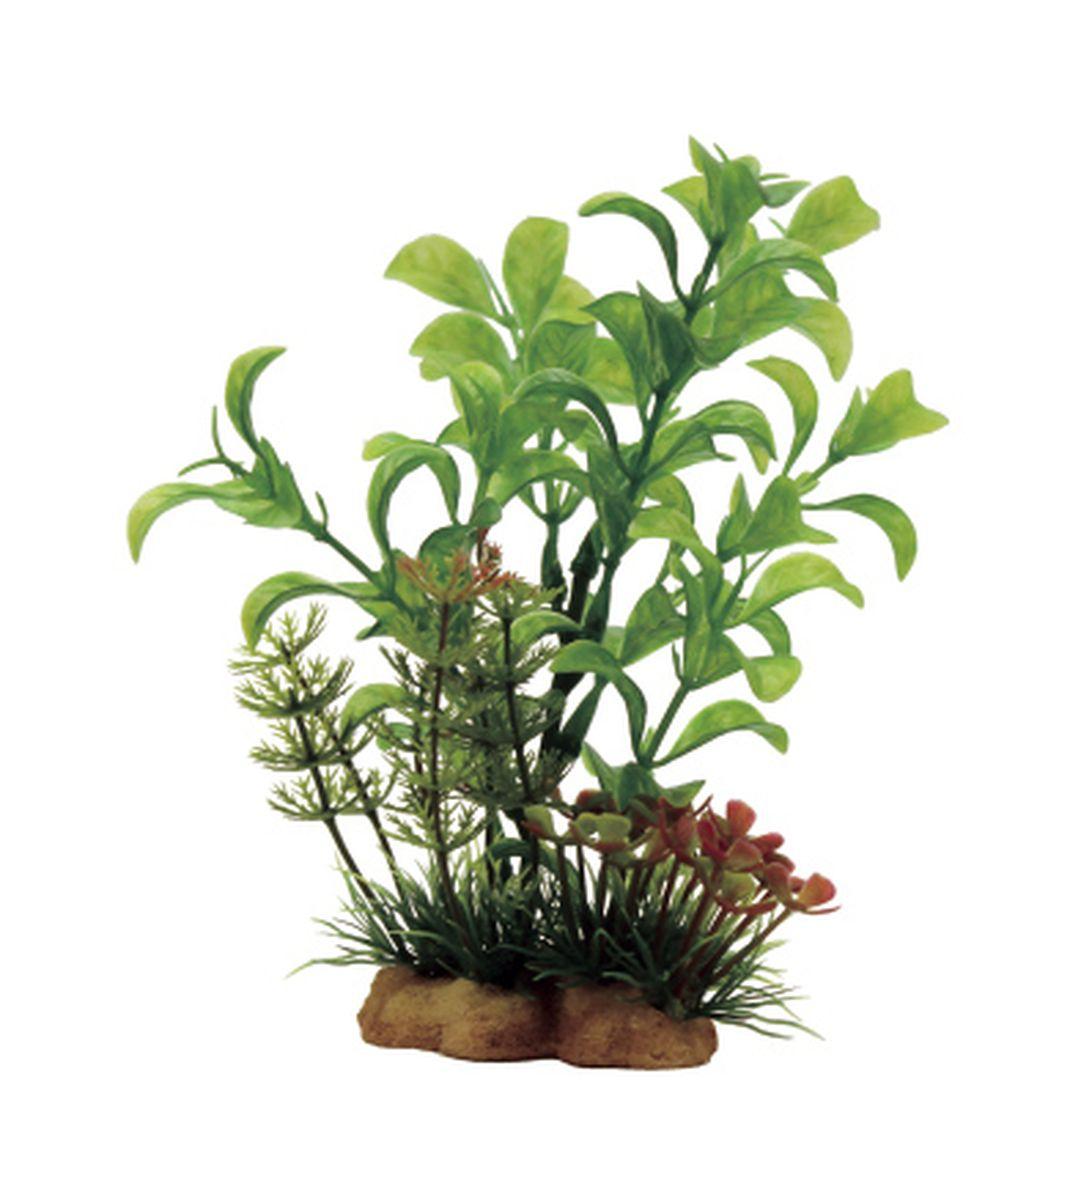 Композиция из растений для аквариума ArtUniq Людвигия, 10 x 5 x 13 см0120710Композиция из растений для аквариума ArtUniq Людвигия, 10 x 5 x 13 см